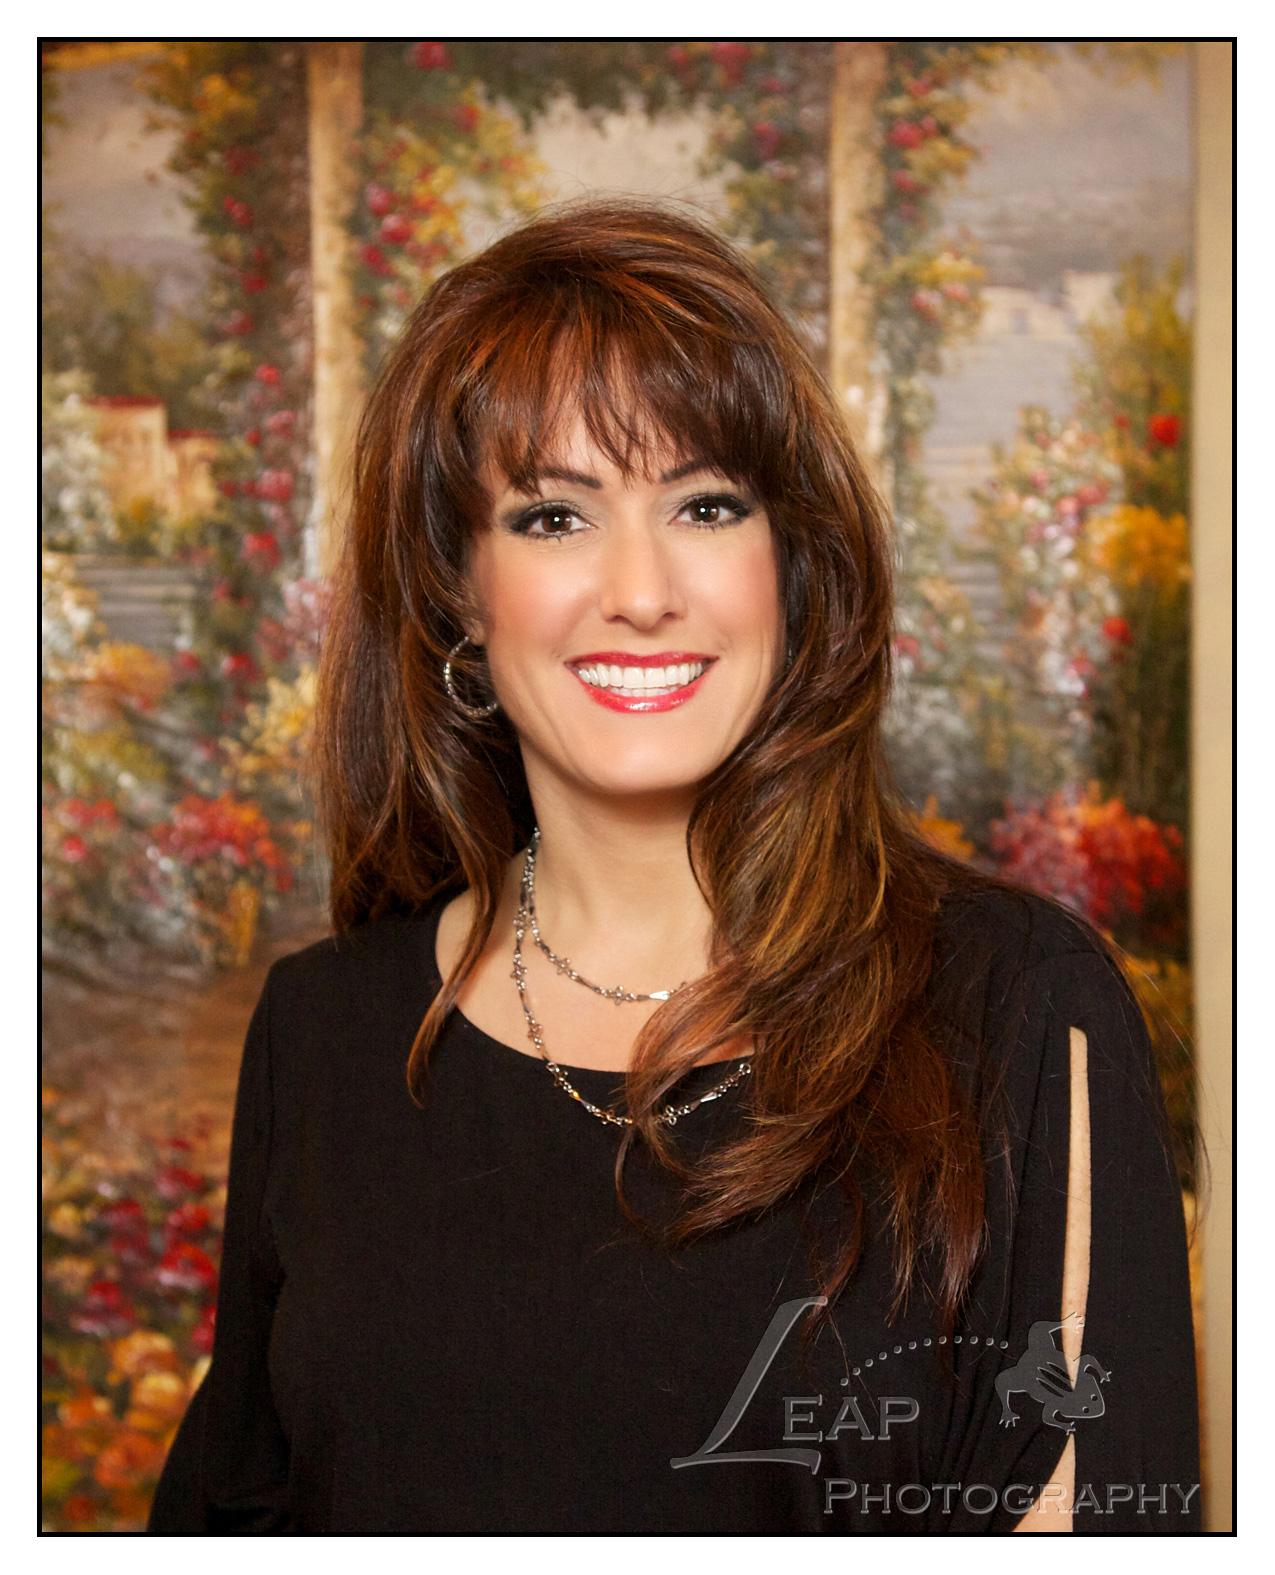 owner of Ealge Day Spa, Desiree Dodson